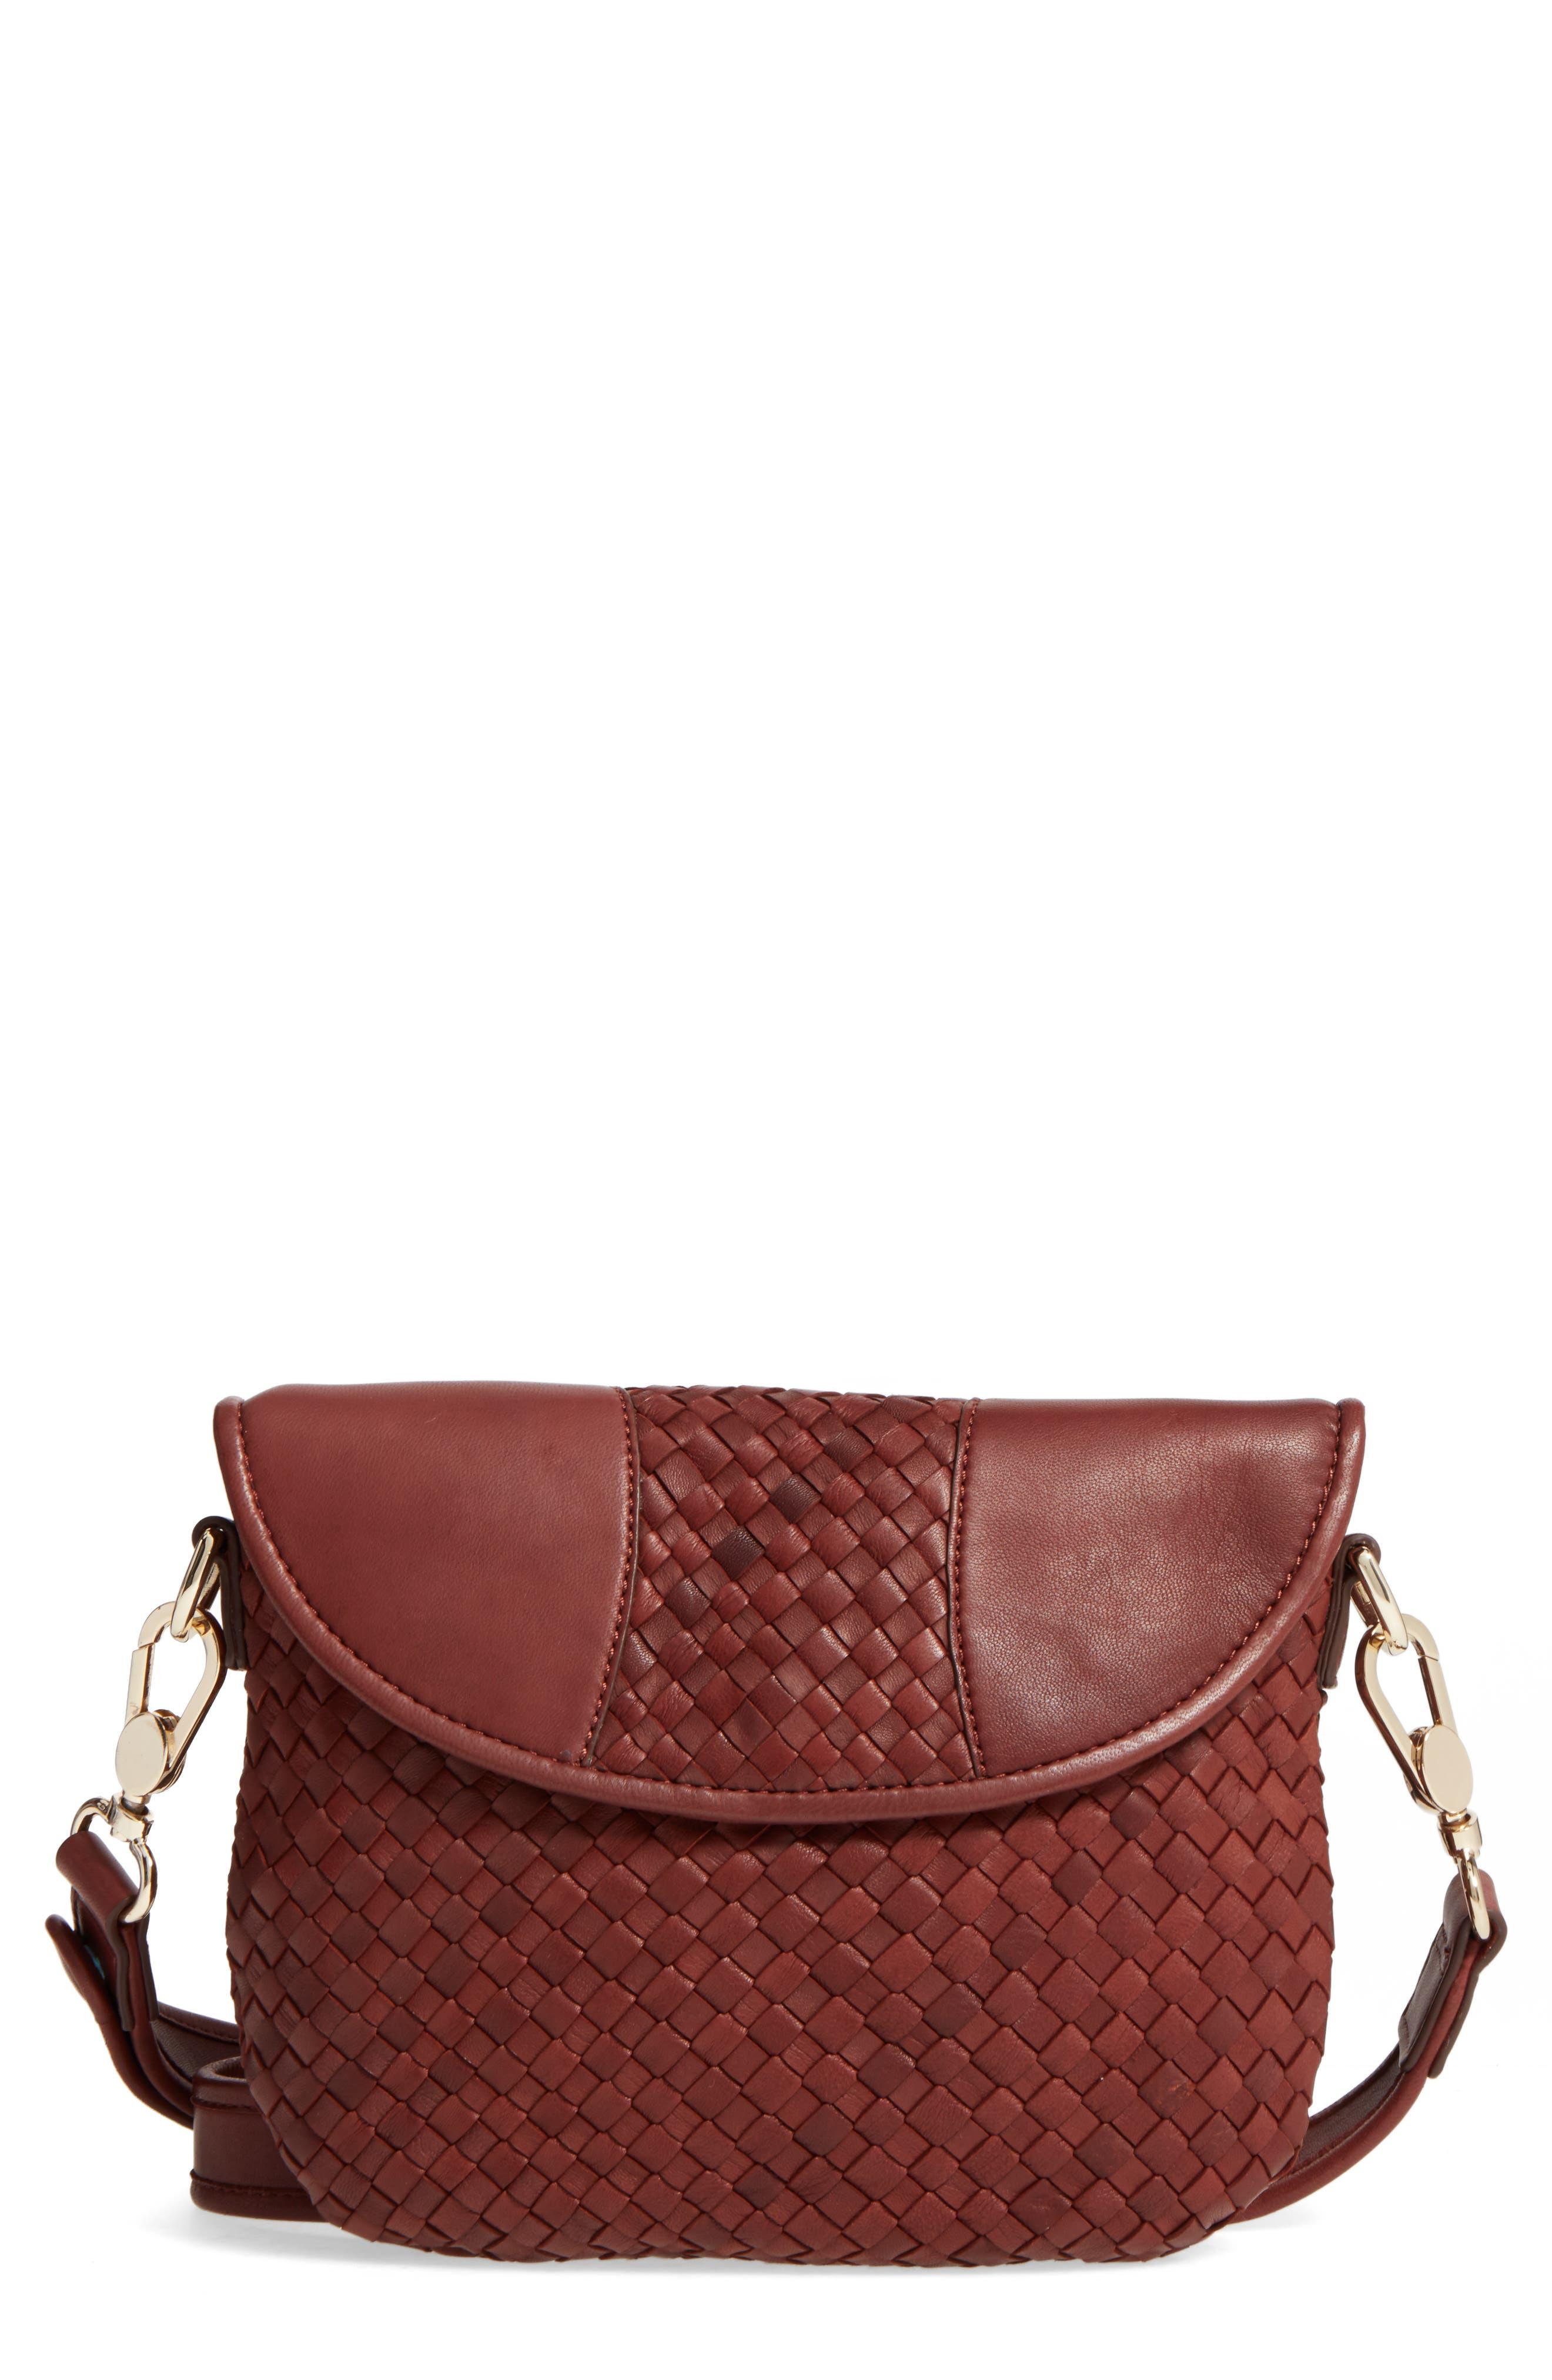 Nola Woven Leather Crossbody,                         Main,                         color, LUGGAGE